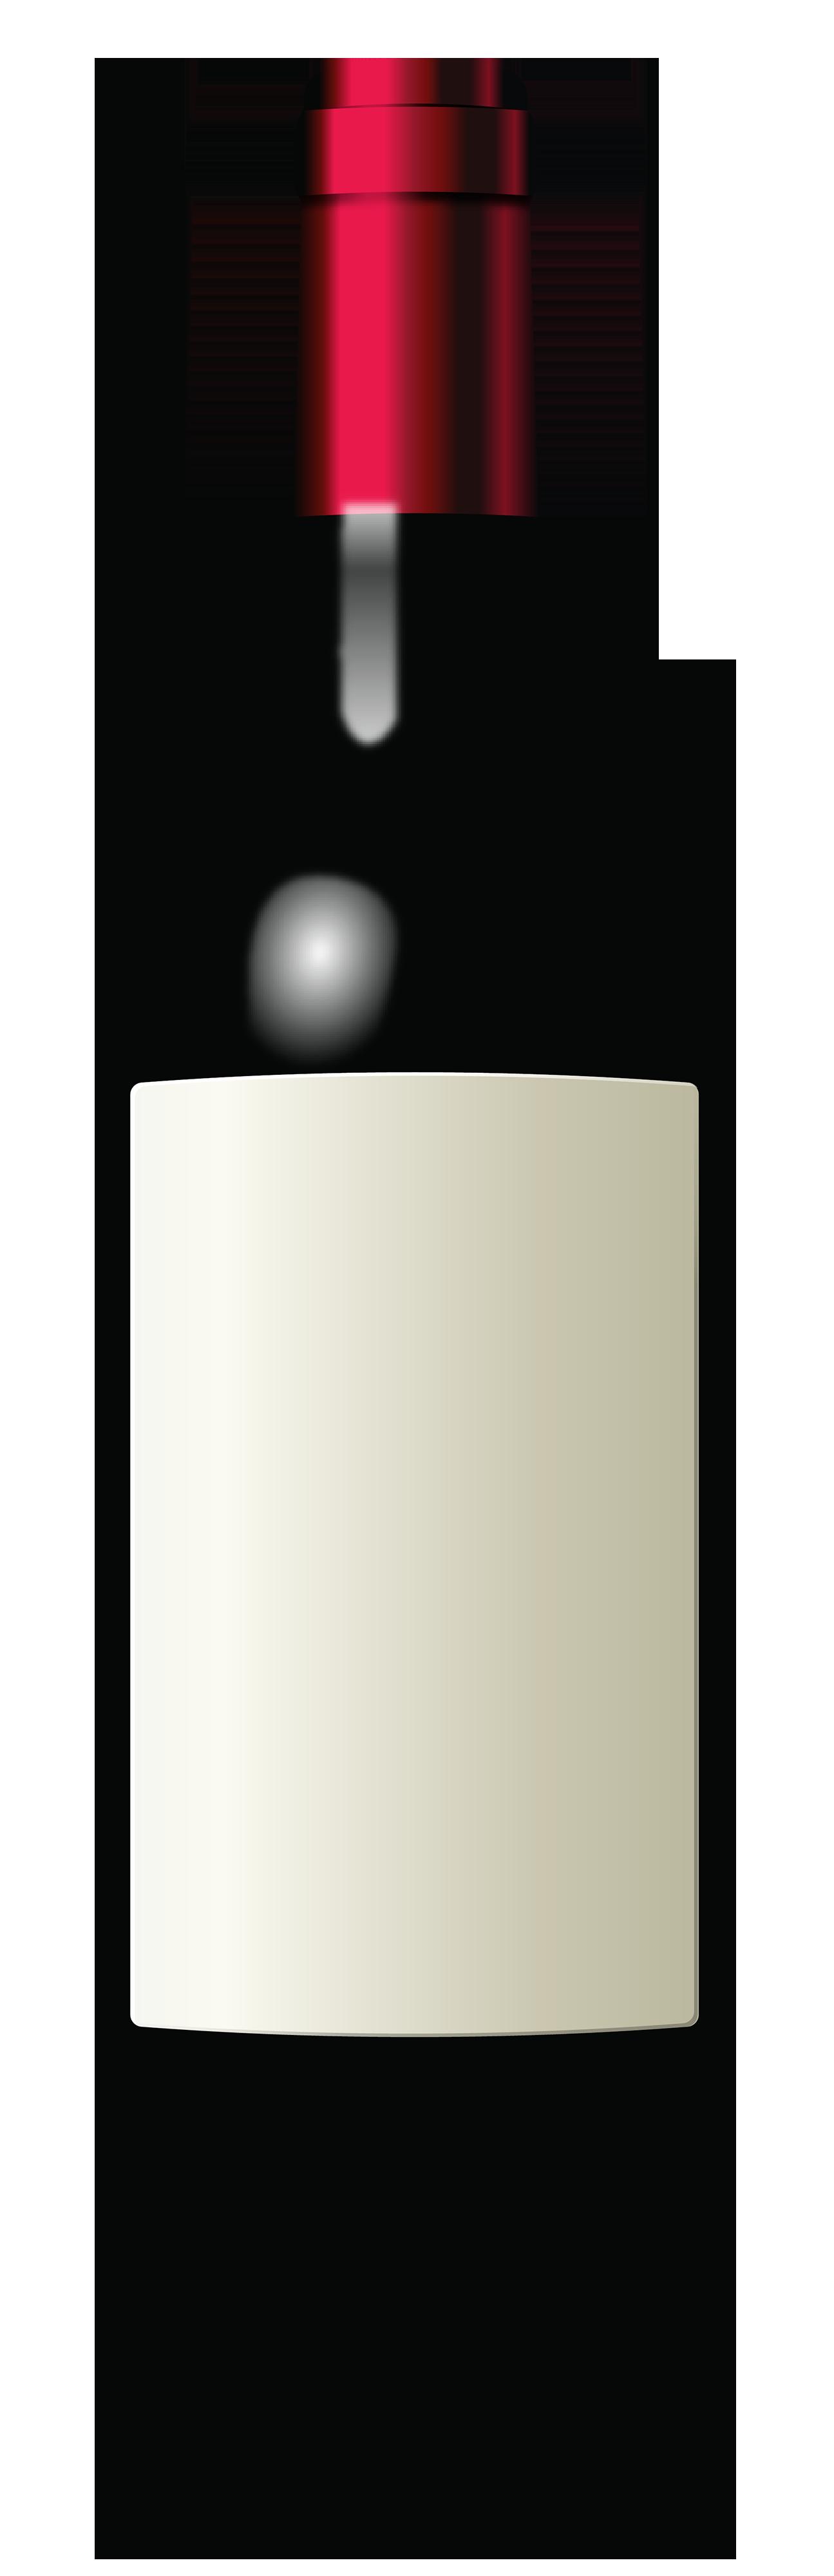 Clipart wine bottles clip freeuse download Wine Bottle Clipart | Free download best Wine Bottle Clipart on ... clip freeuse download